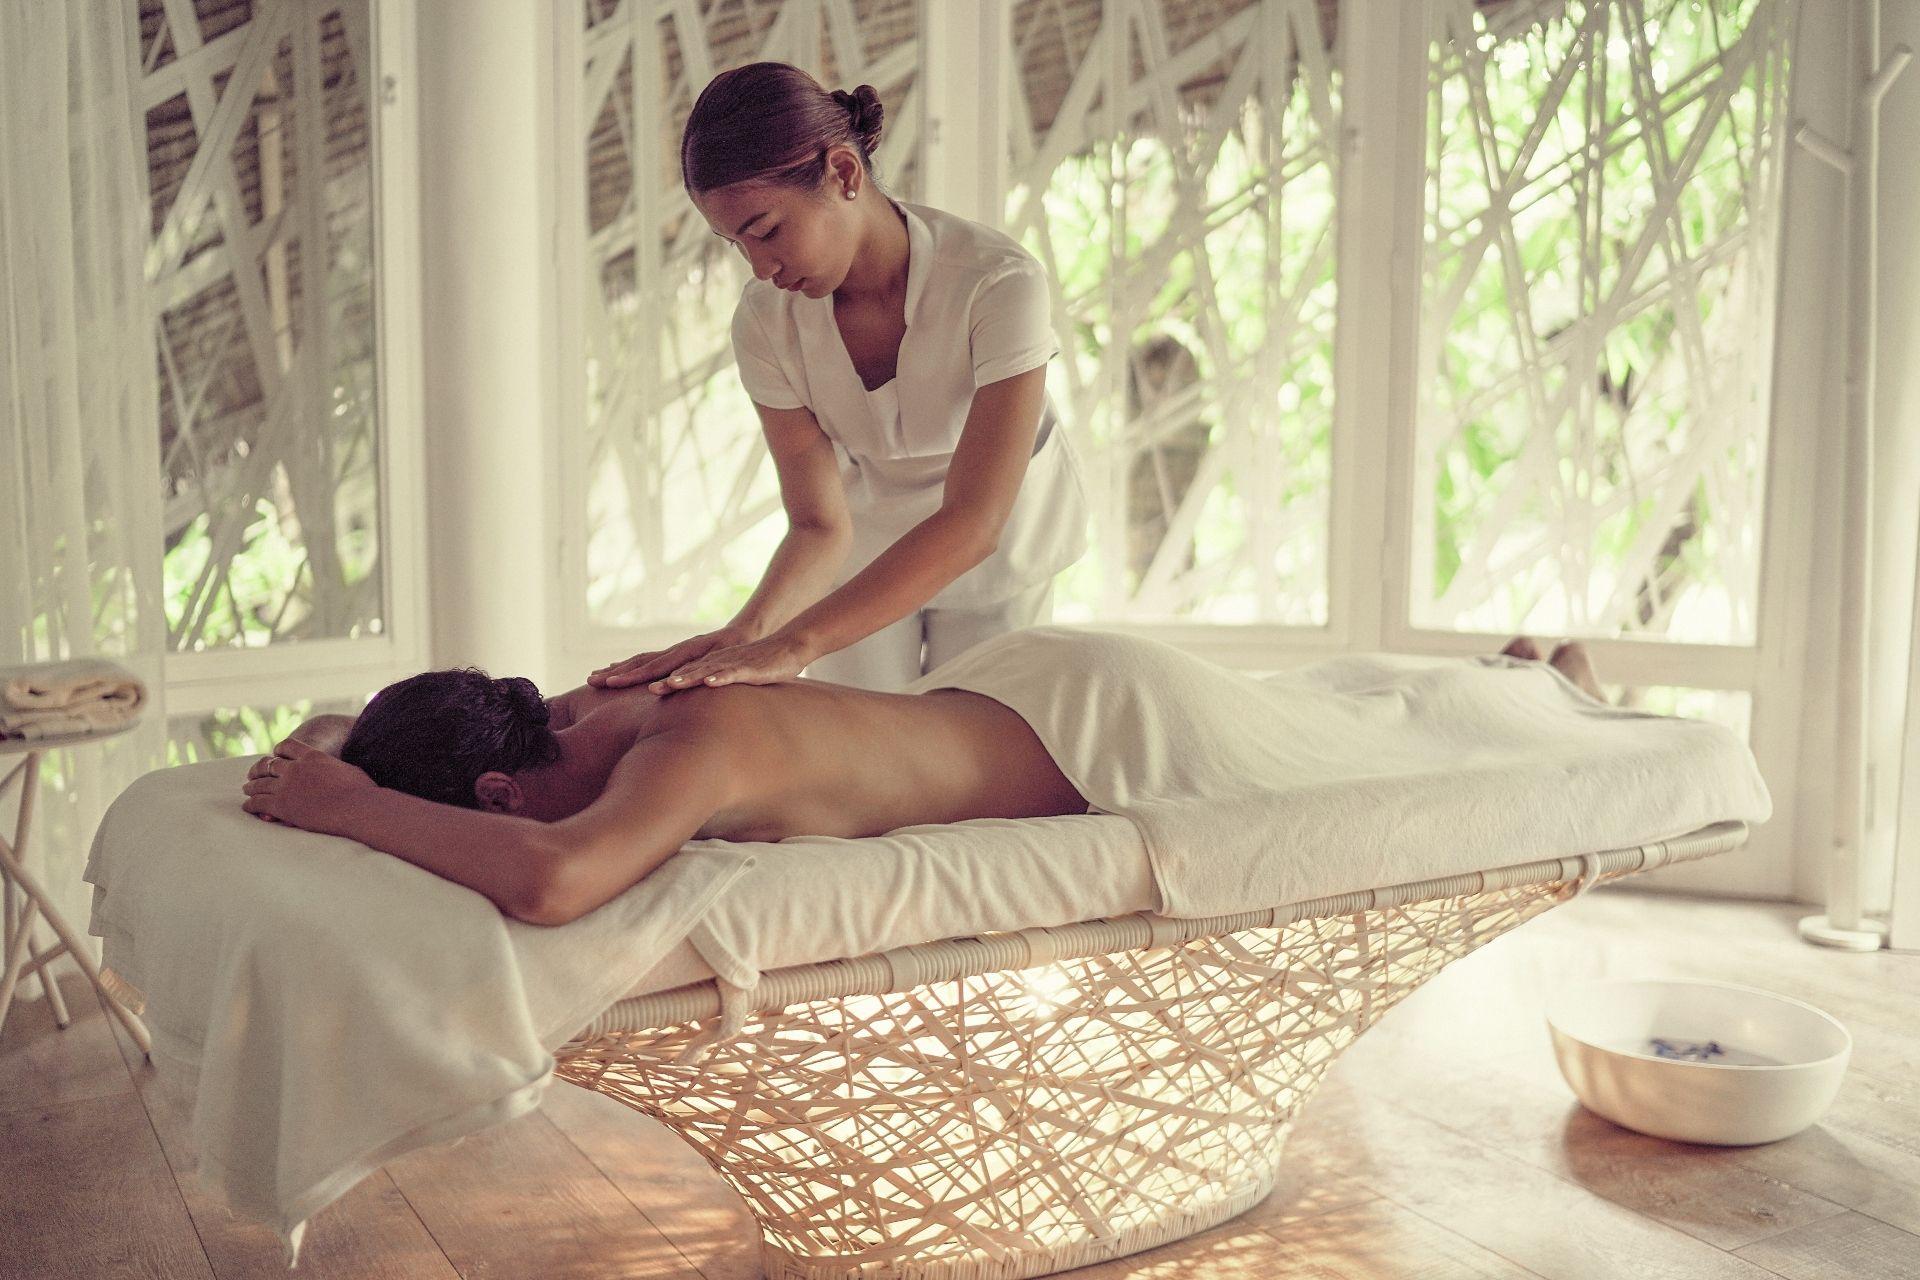 Lovely treatment (Photo credit: Phil Blandow)